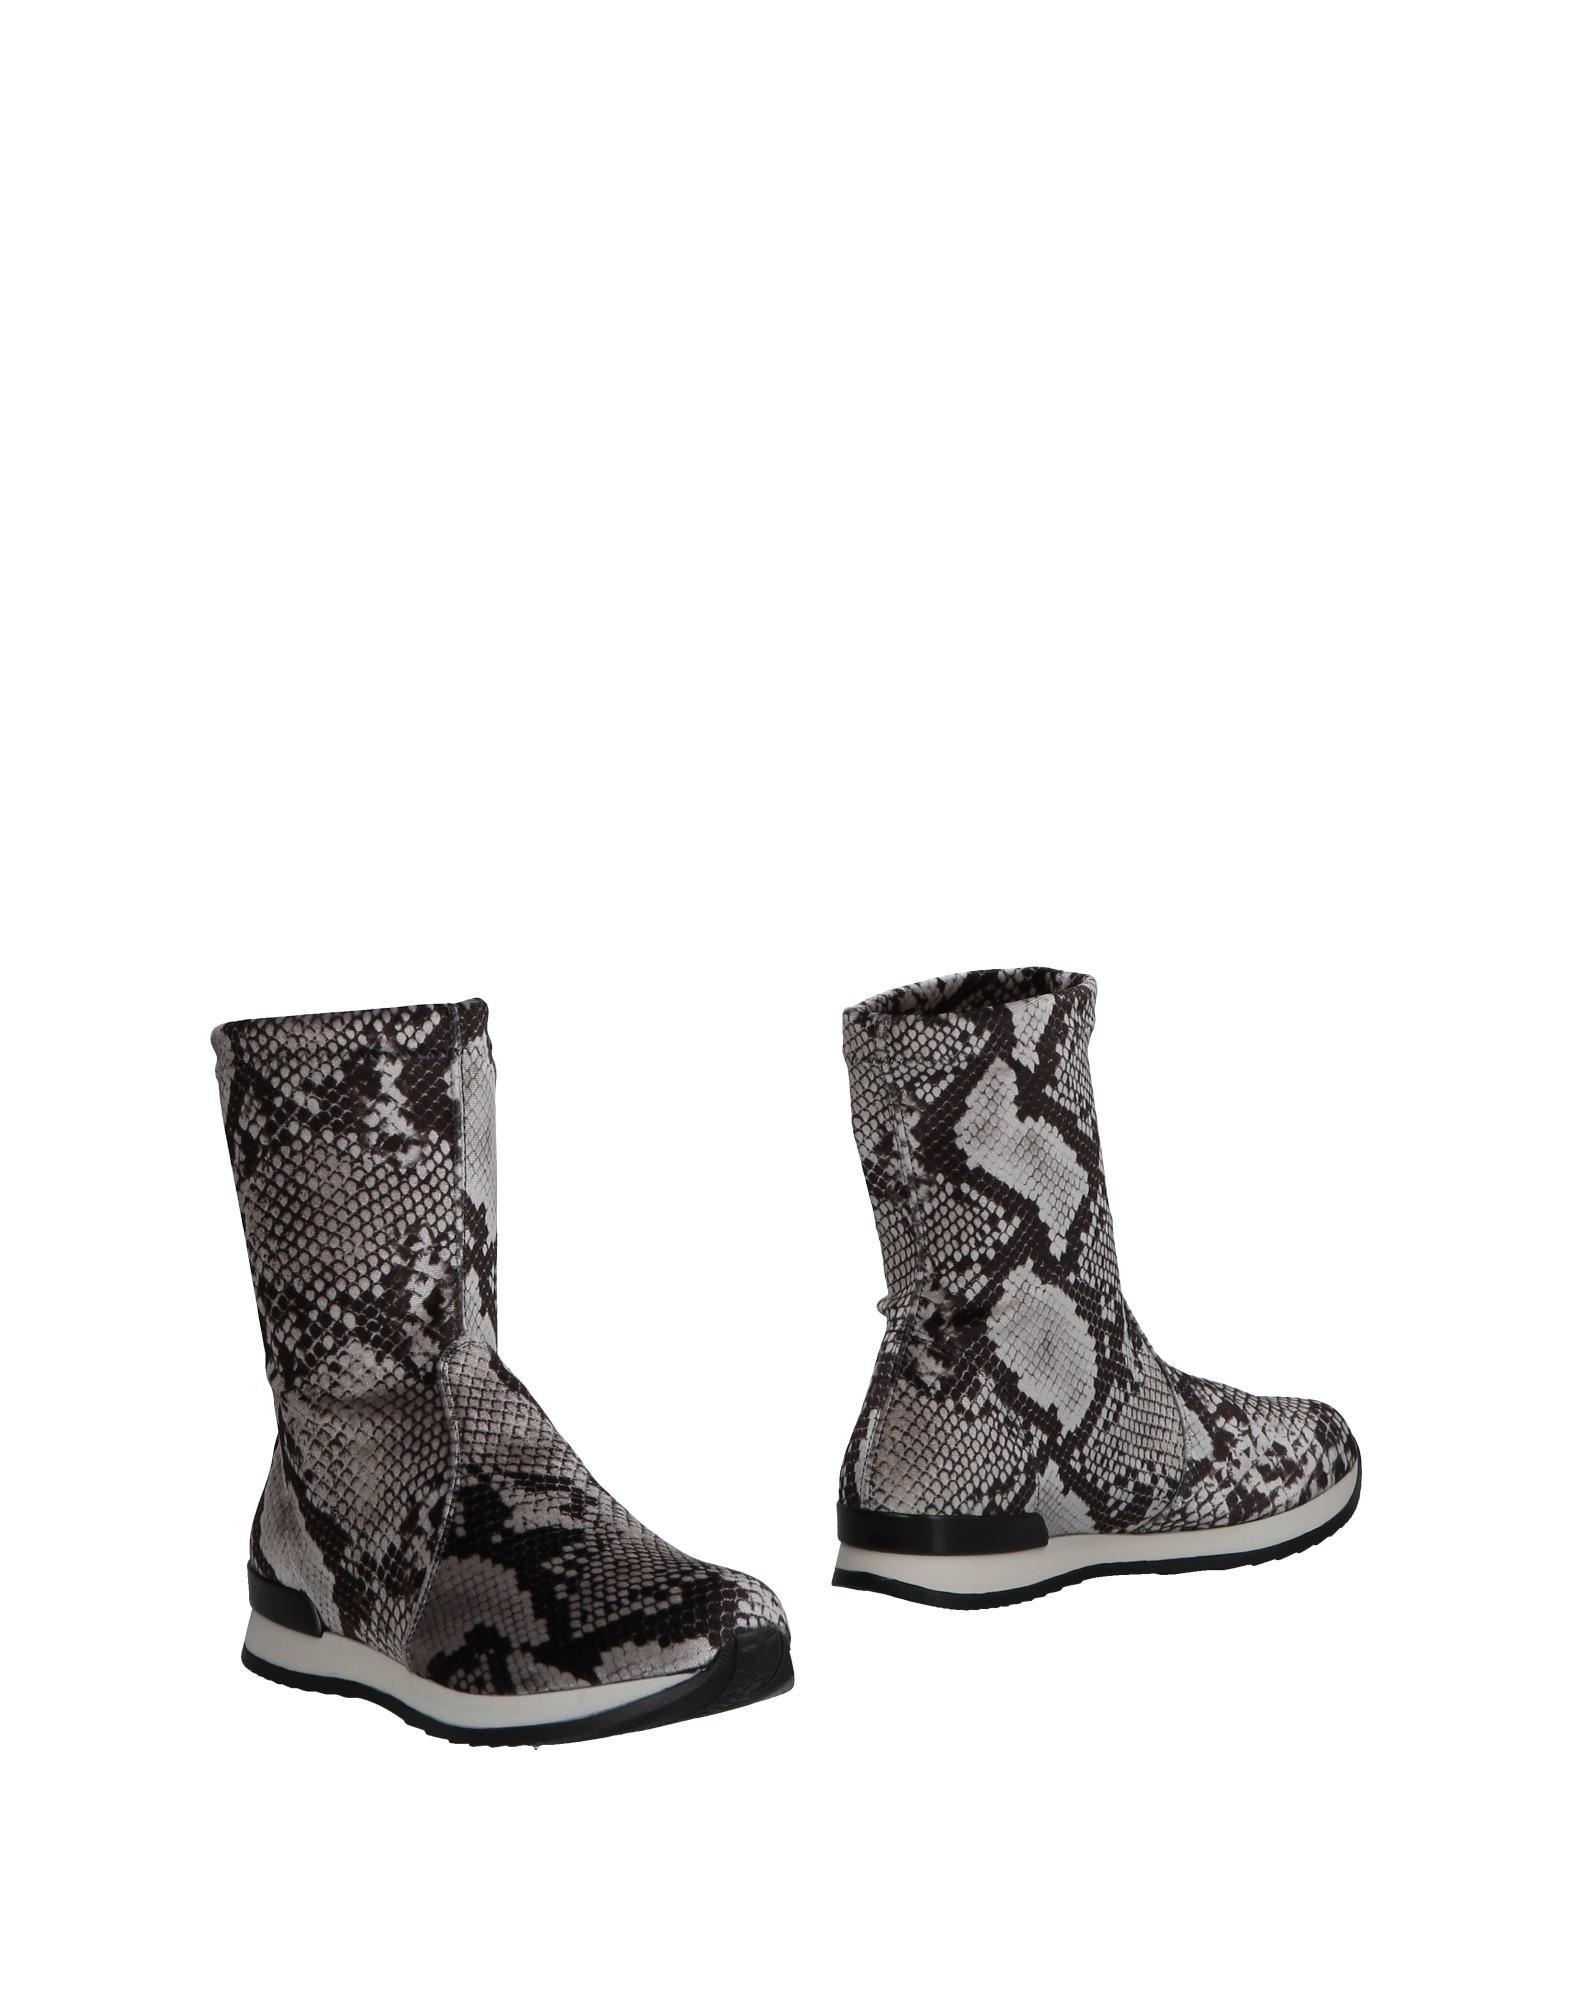 NR RAPISARDI Полусапоги и высокие ботинки ботинки swims ботинки без каблука